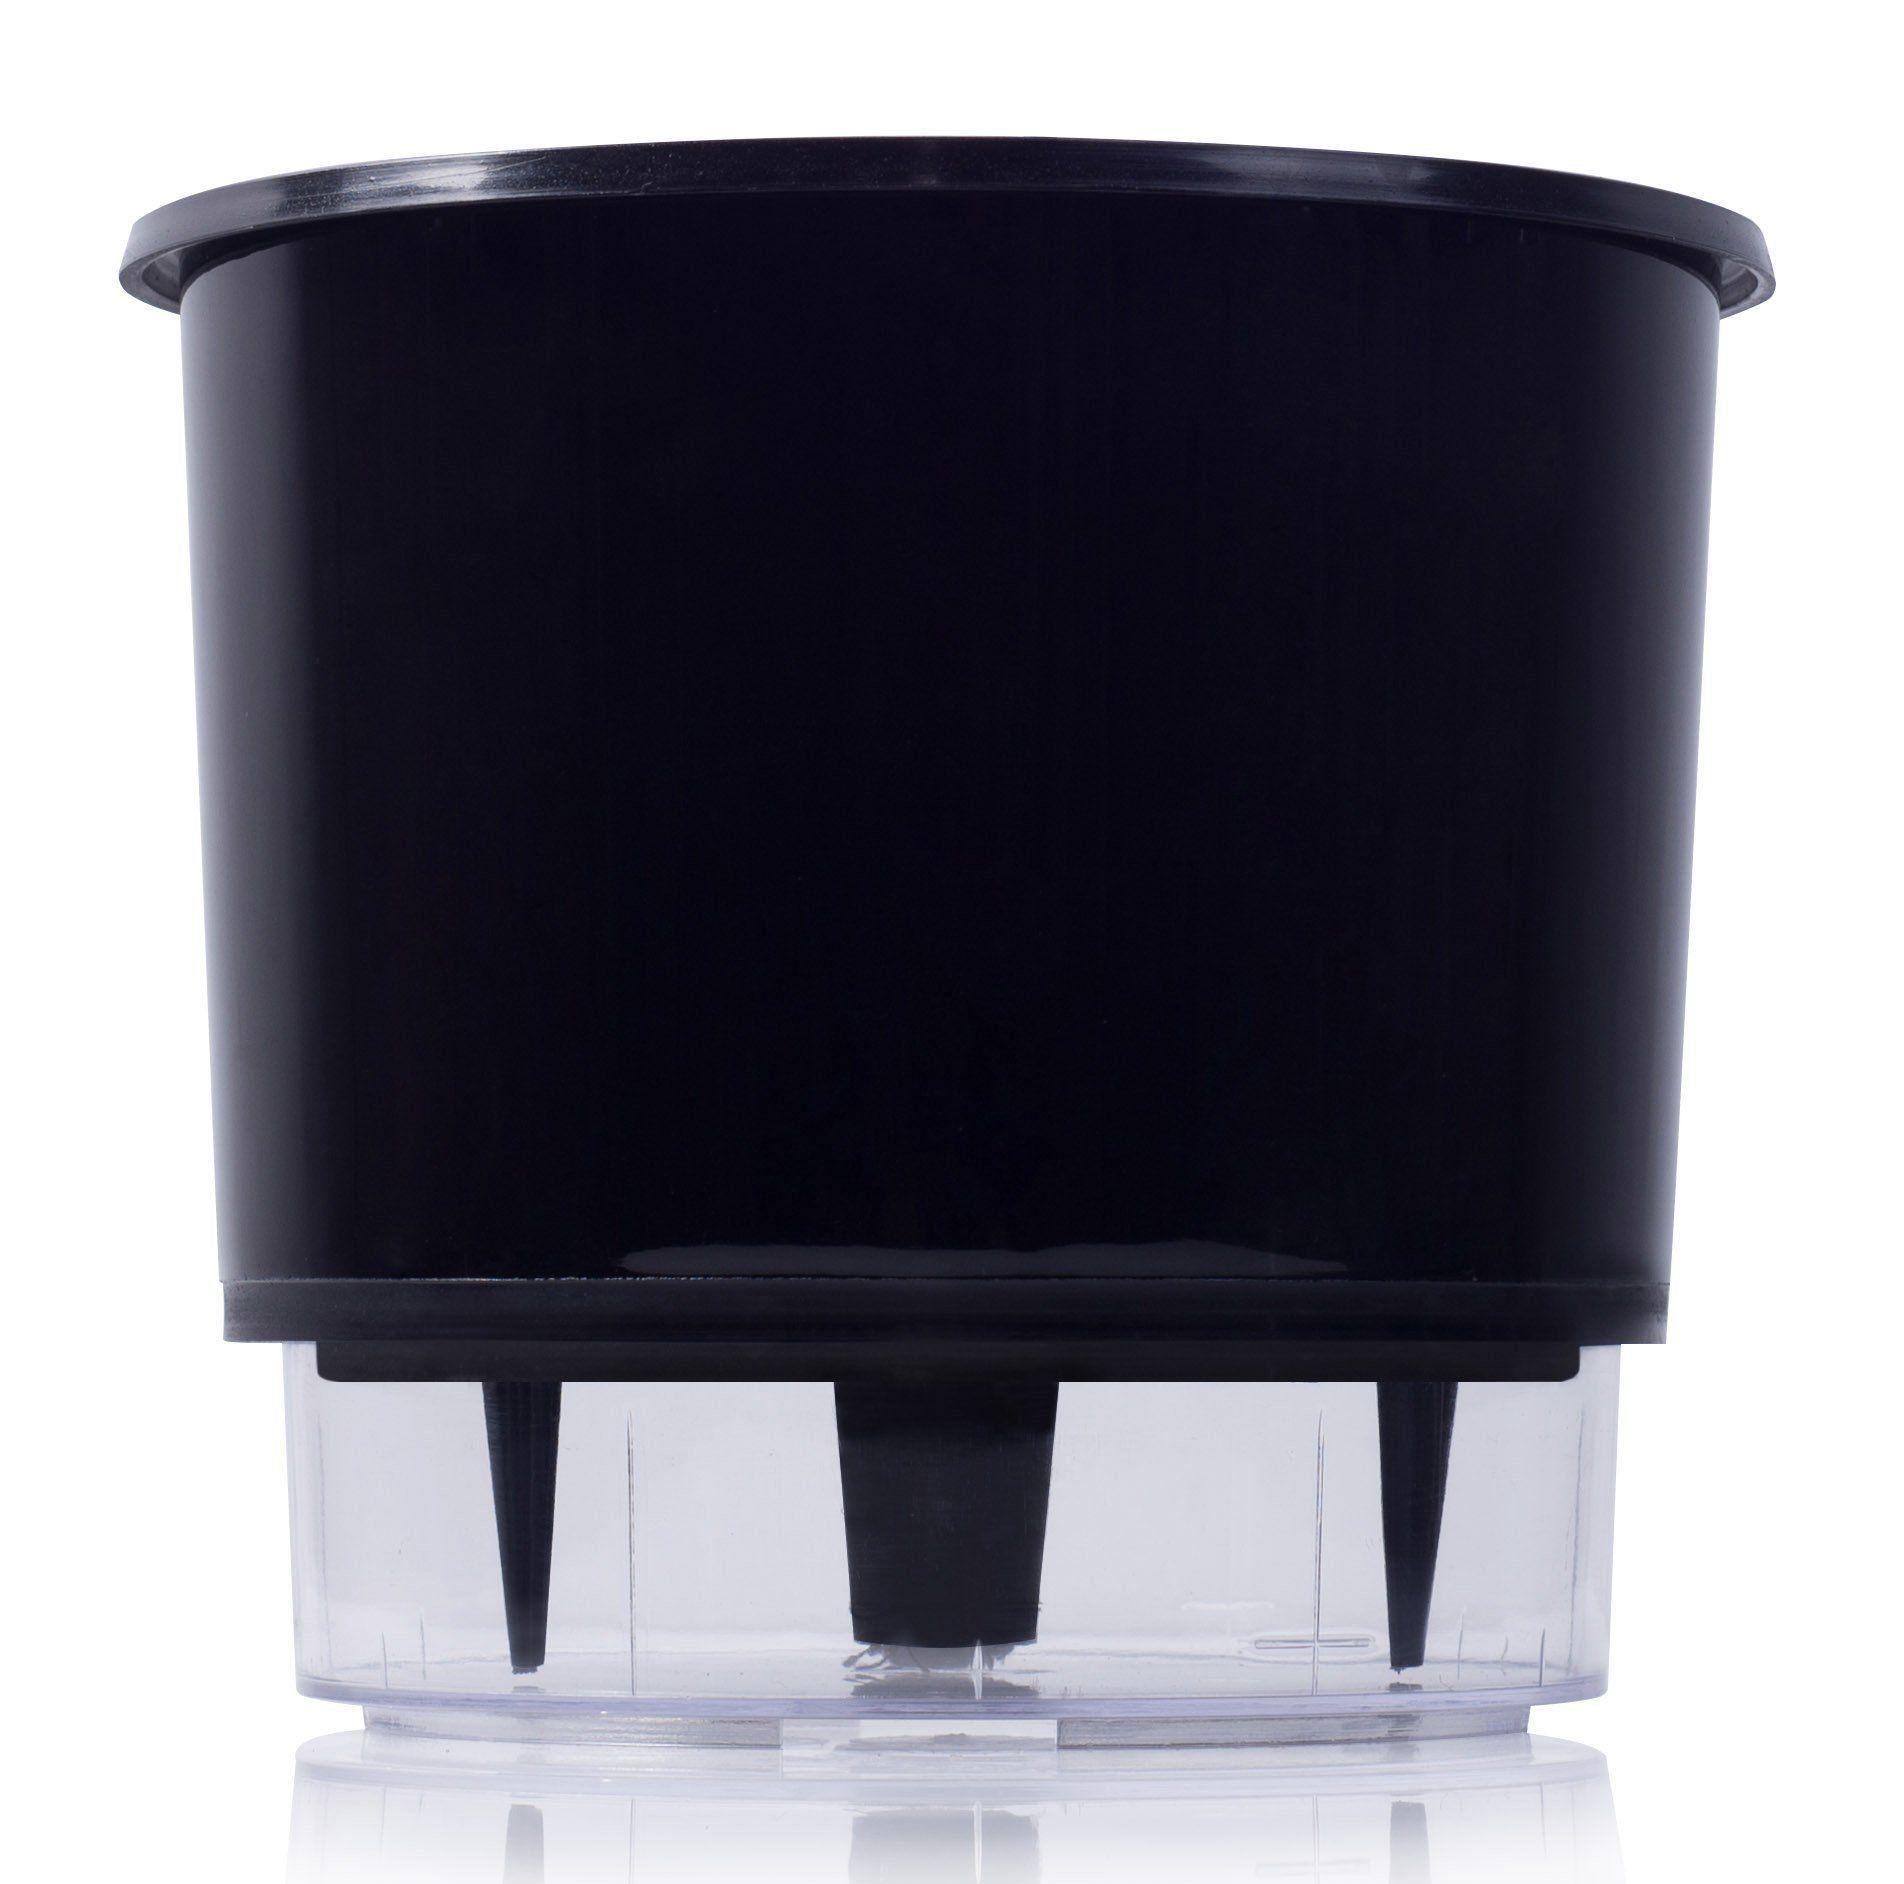 Vaso Autoirrigável Pequeno 12cm x 11cm Preto